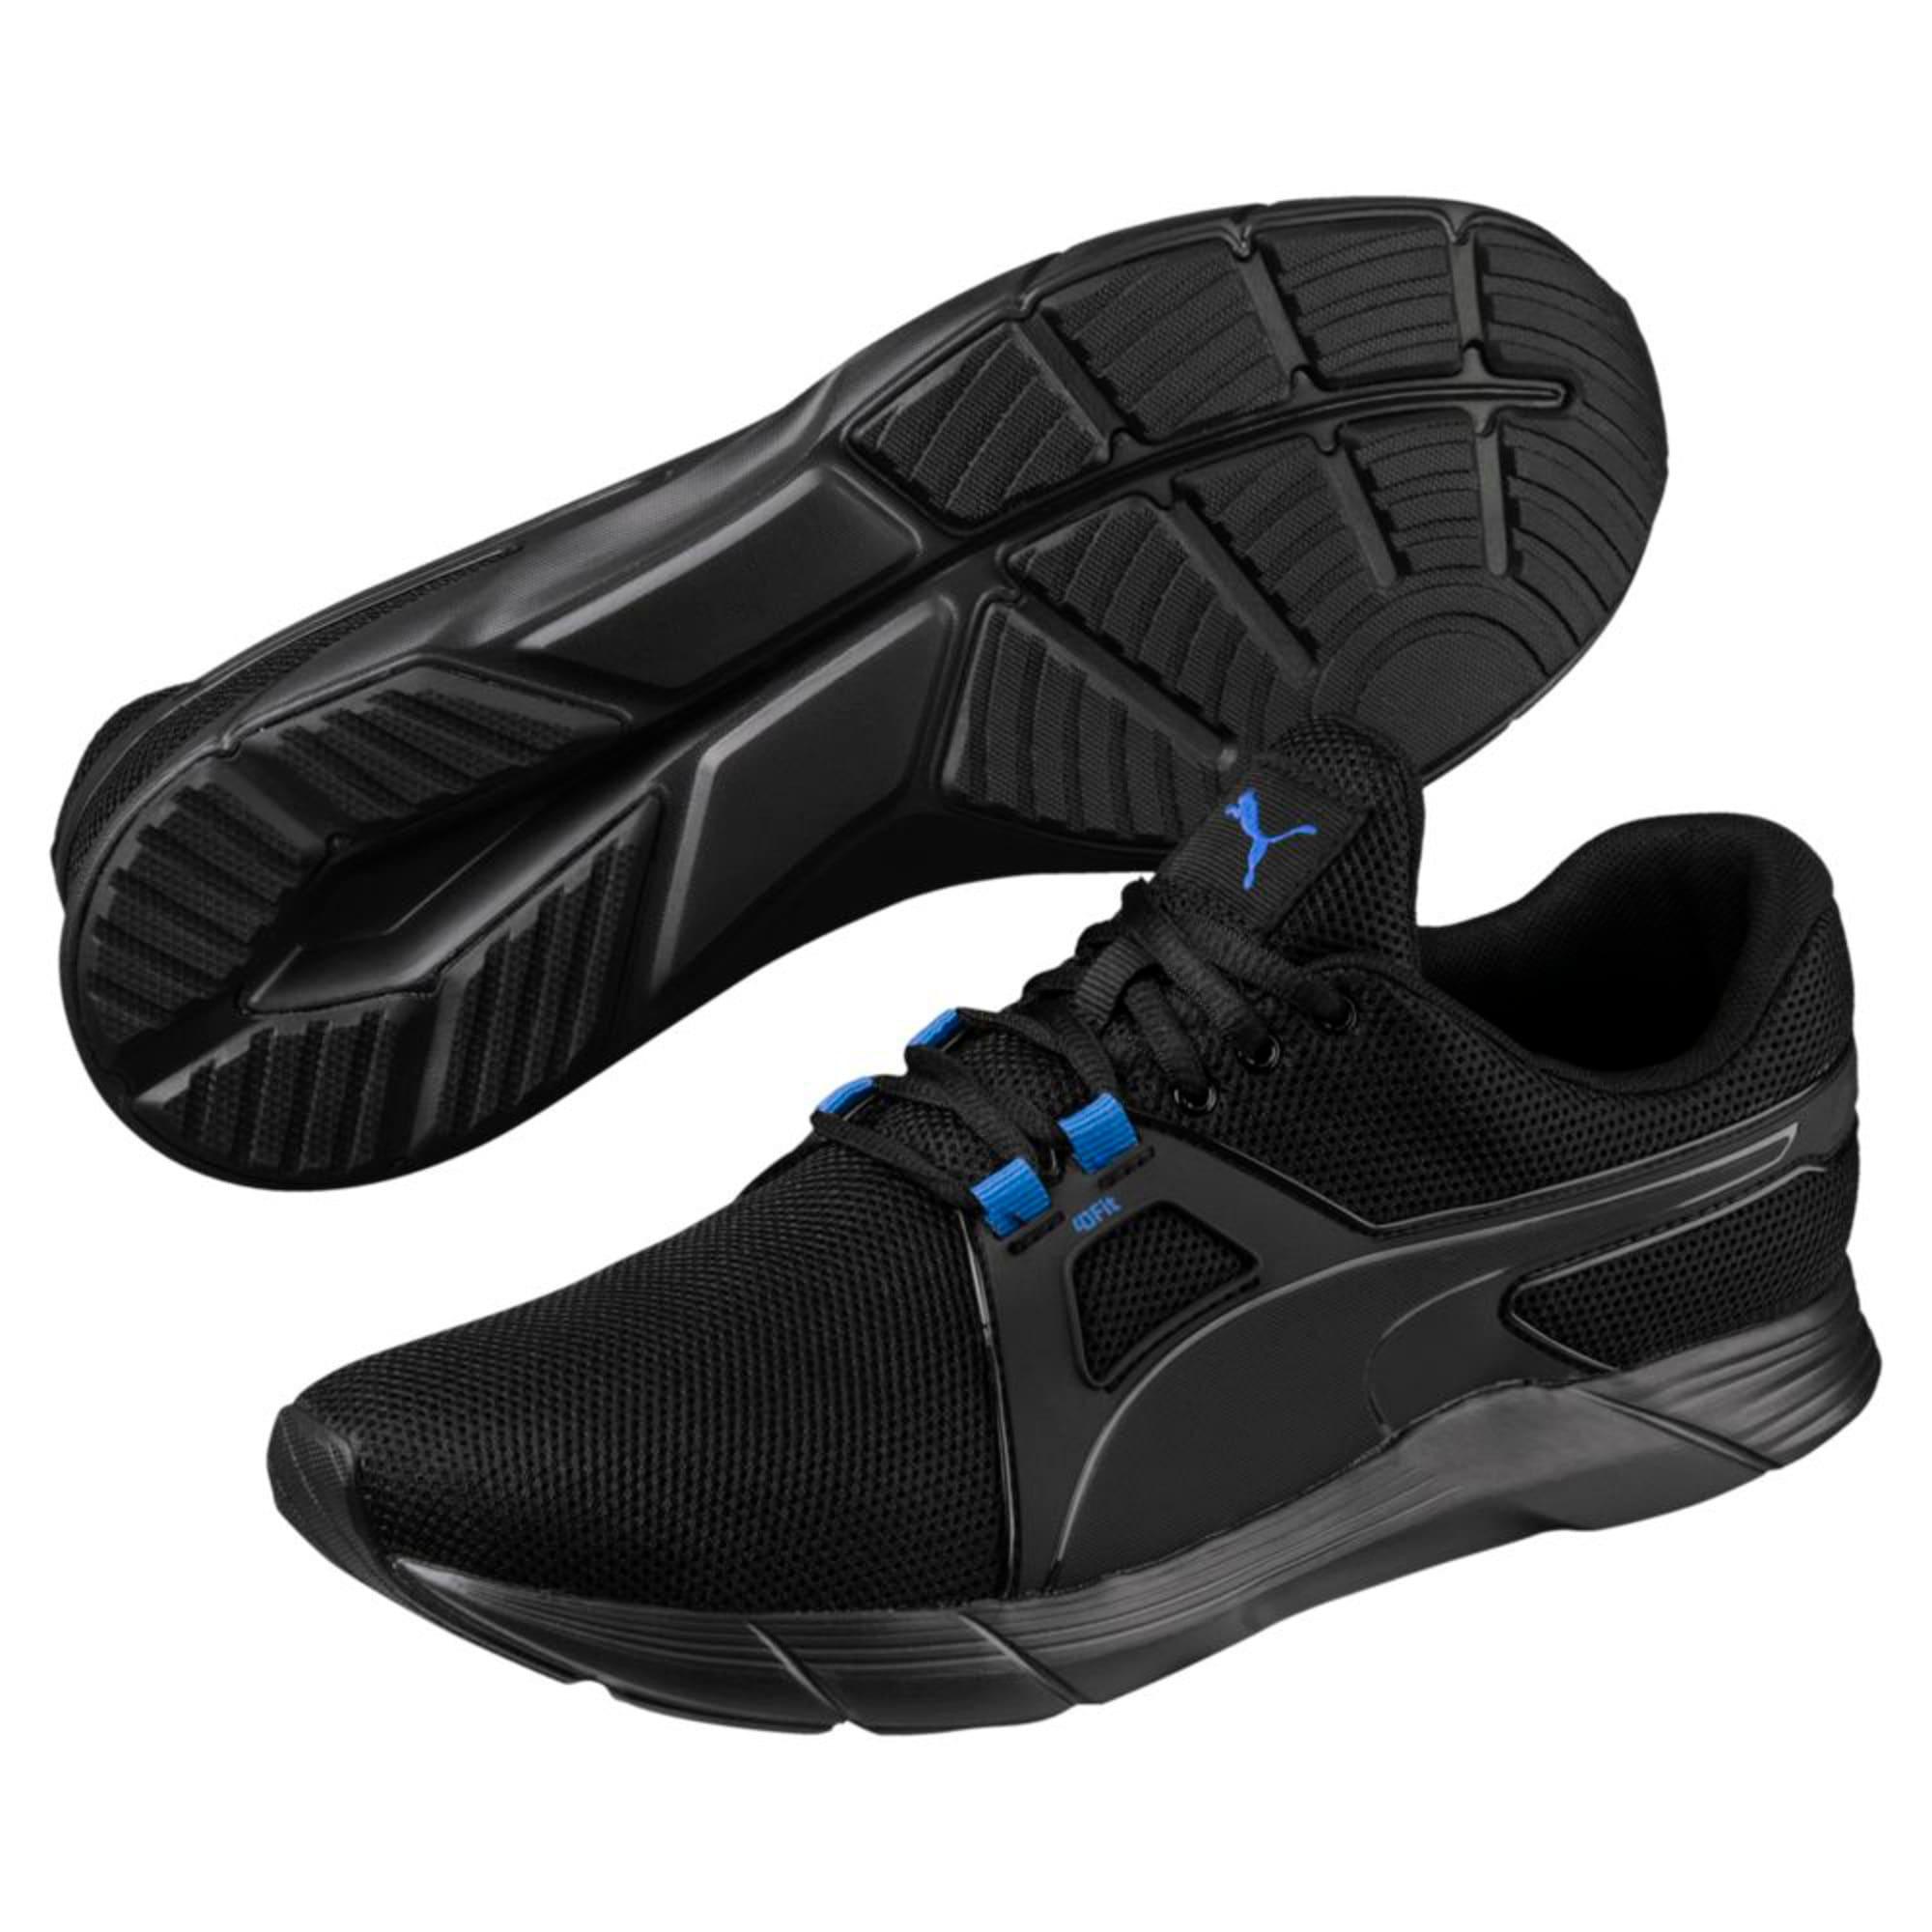 Thumbnail 6 of Propel XT Men's Training Shoes, Puma Black-Strong Blue, medium-IND